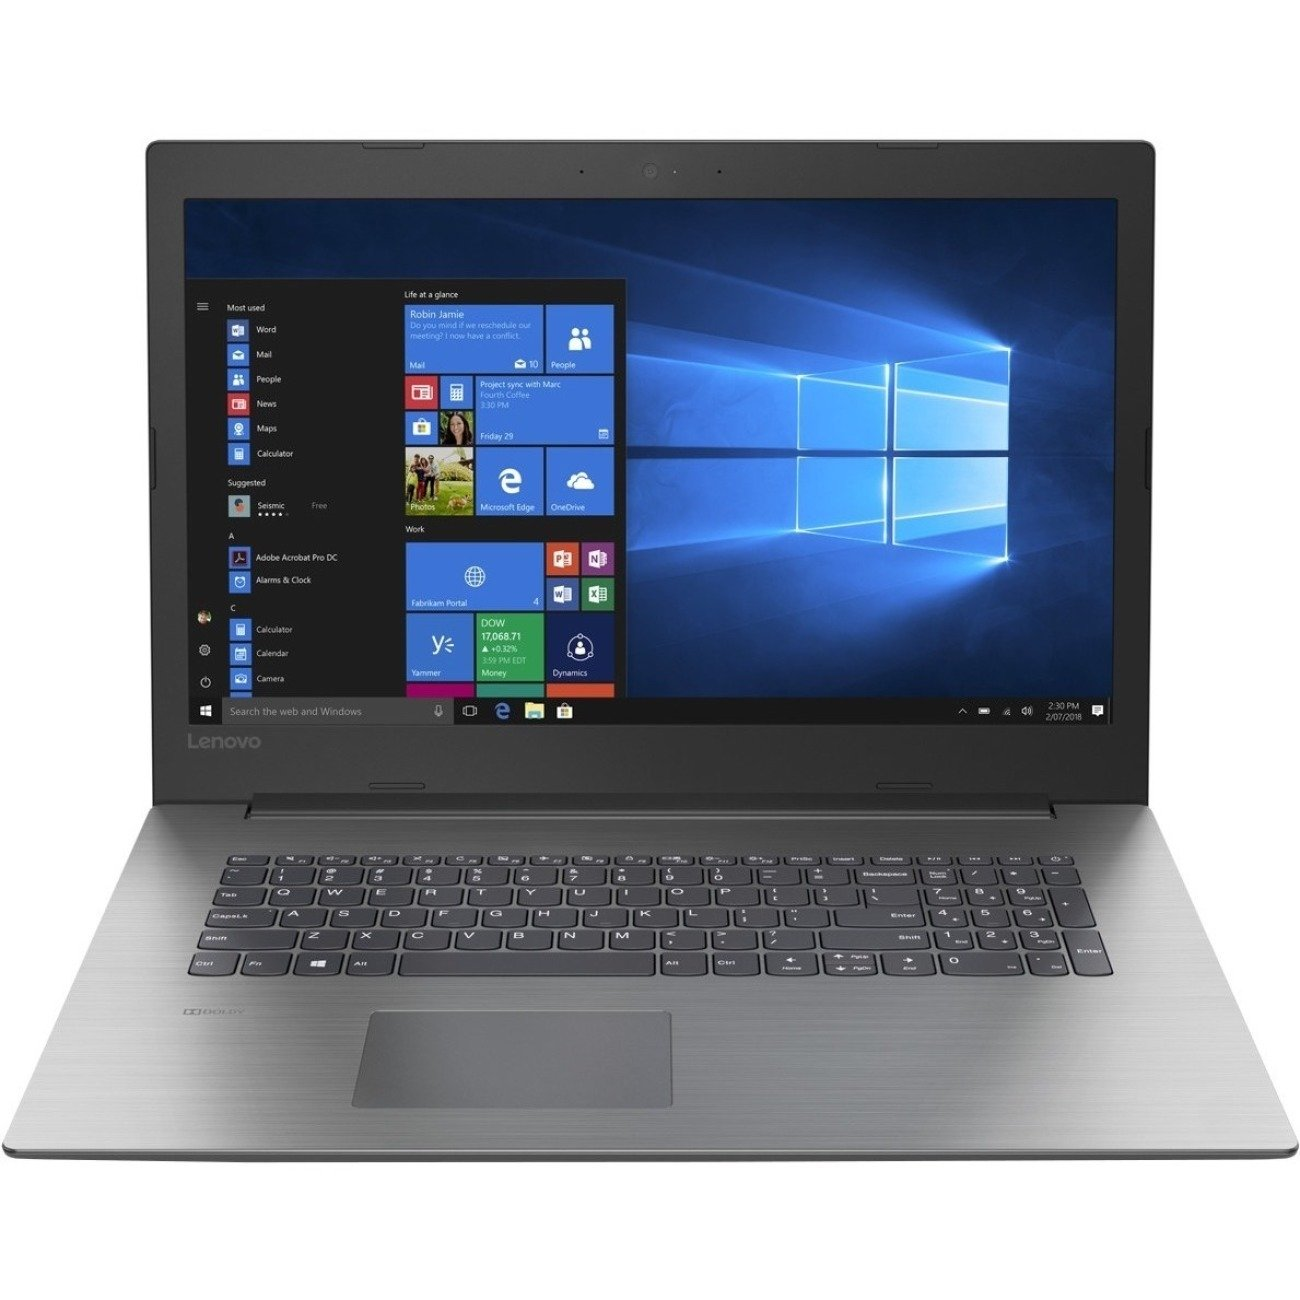 Lenovo IdeaPad 330-17AST 81D70001US 17.3″ LCD Notebook – AMD A-Series